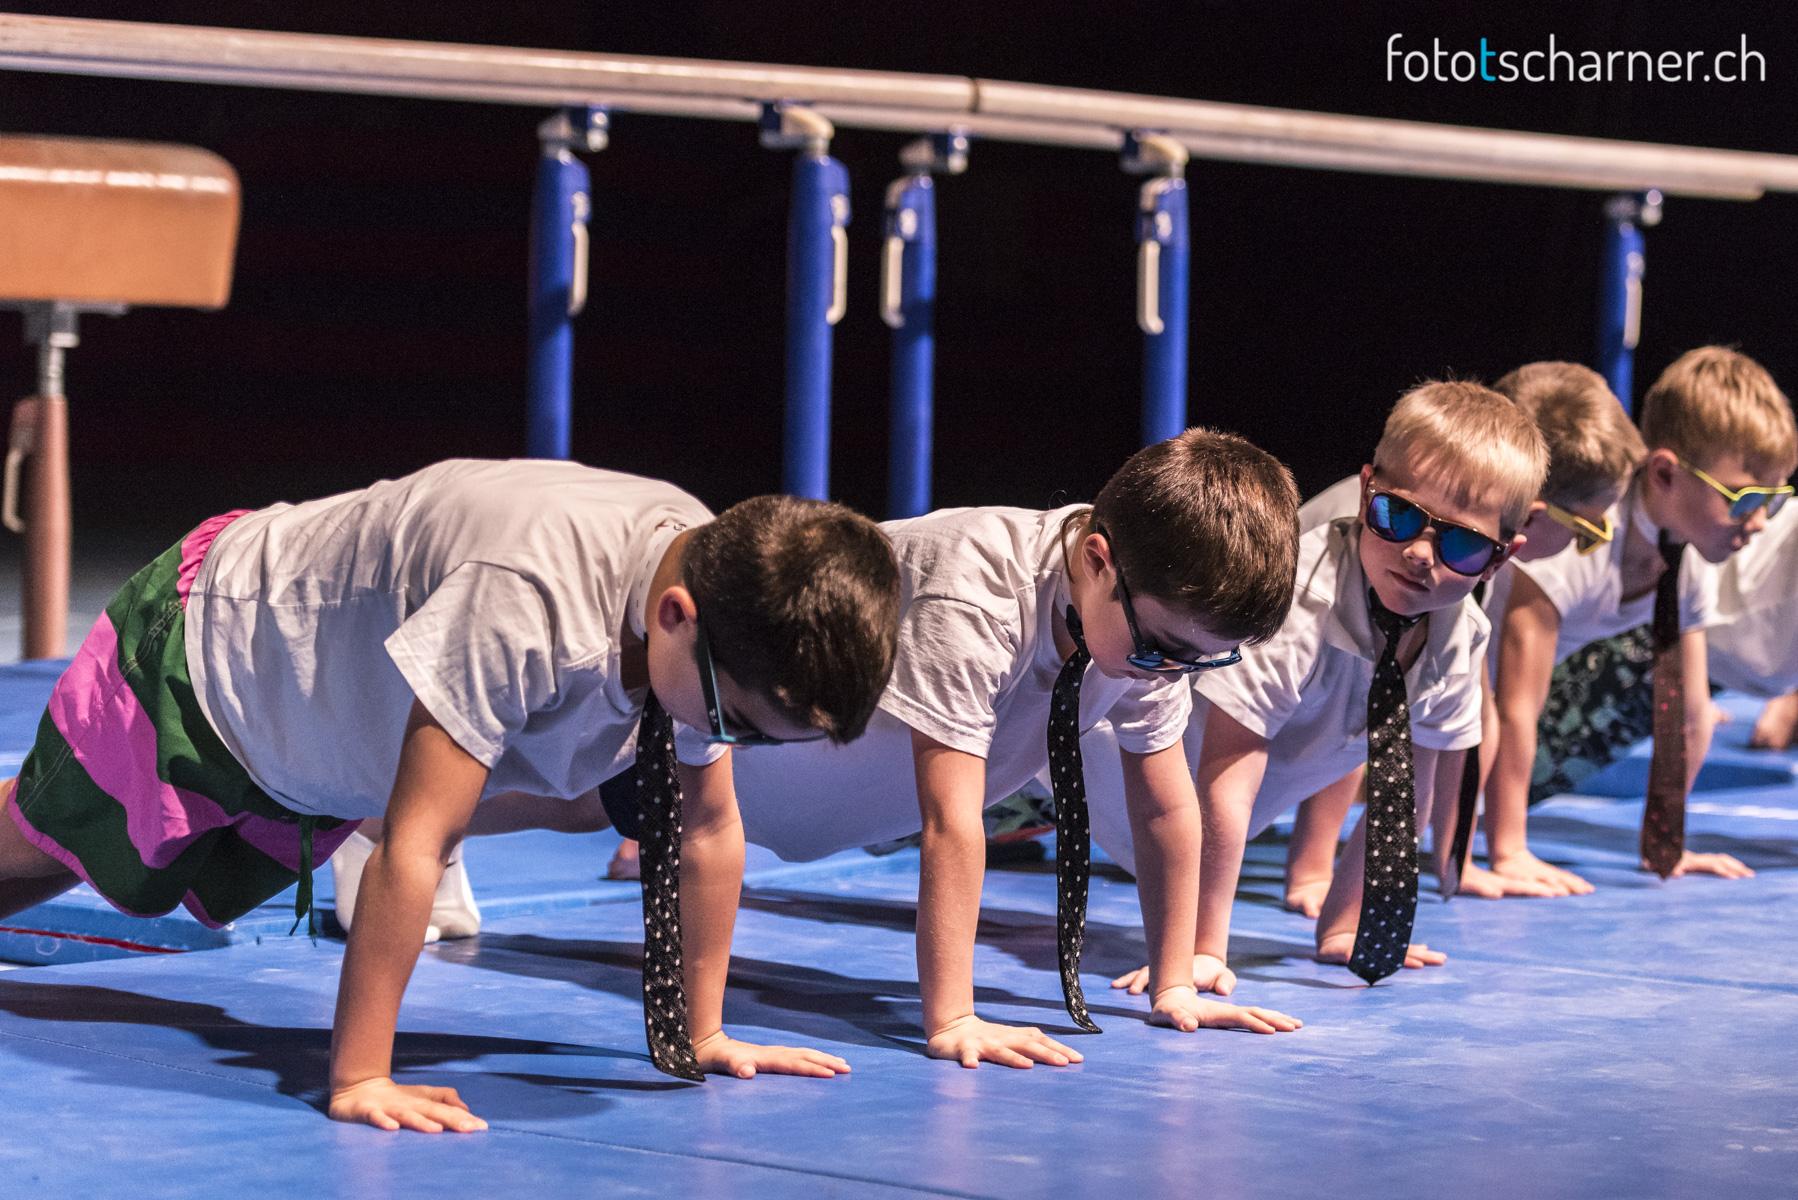 160116 1527 - Turnfabrik Show 2016 Frauenfeld -  - (c) Daniel Tscharner (_D813741)